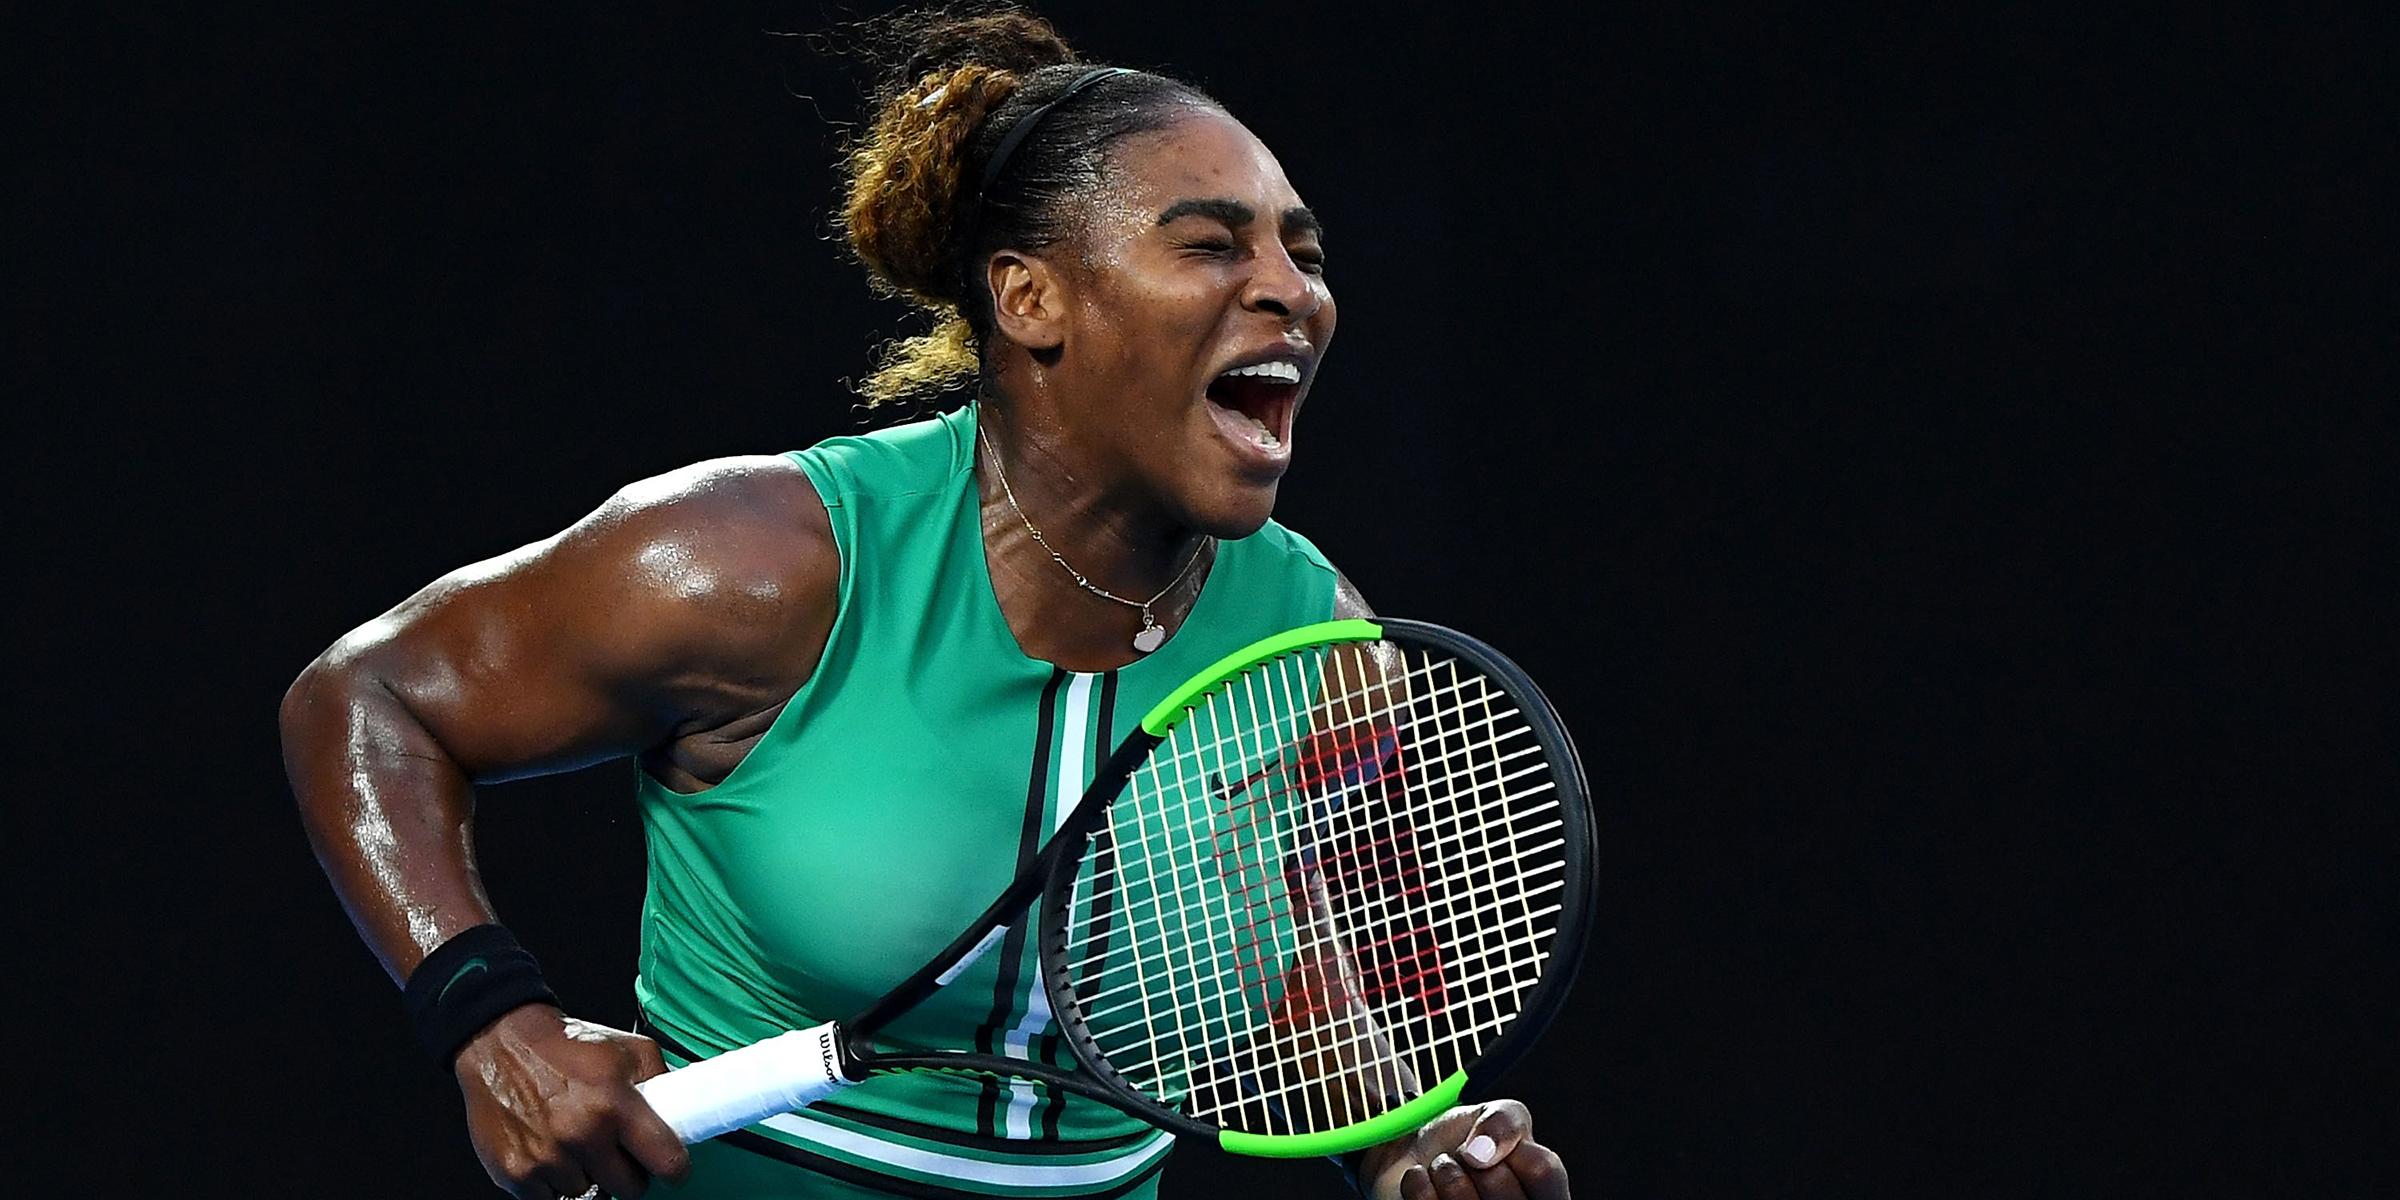 Serena Williams Nike Dream Crazier Ad Celebrates Female Athletes